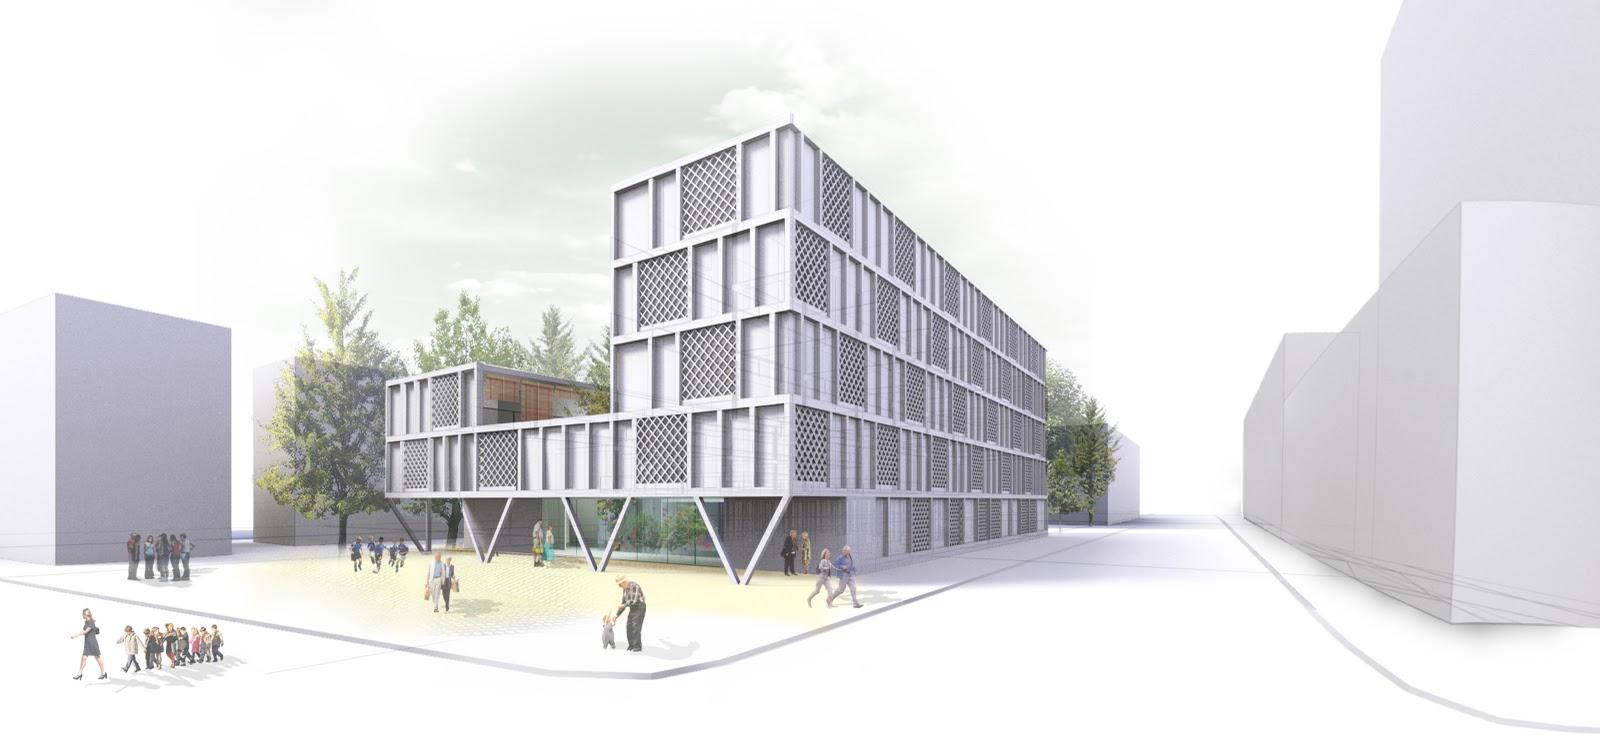 Bandada studio concurso centro de d a y viviendas en - Flexo arquitectura ...